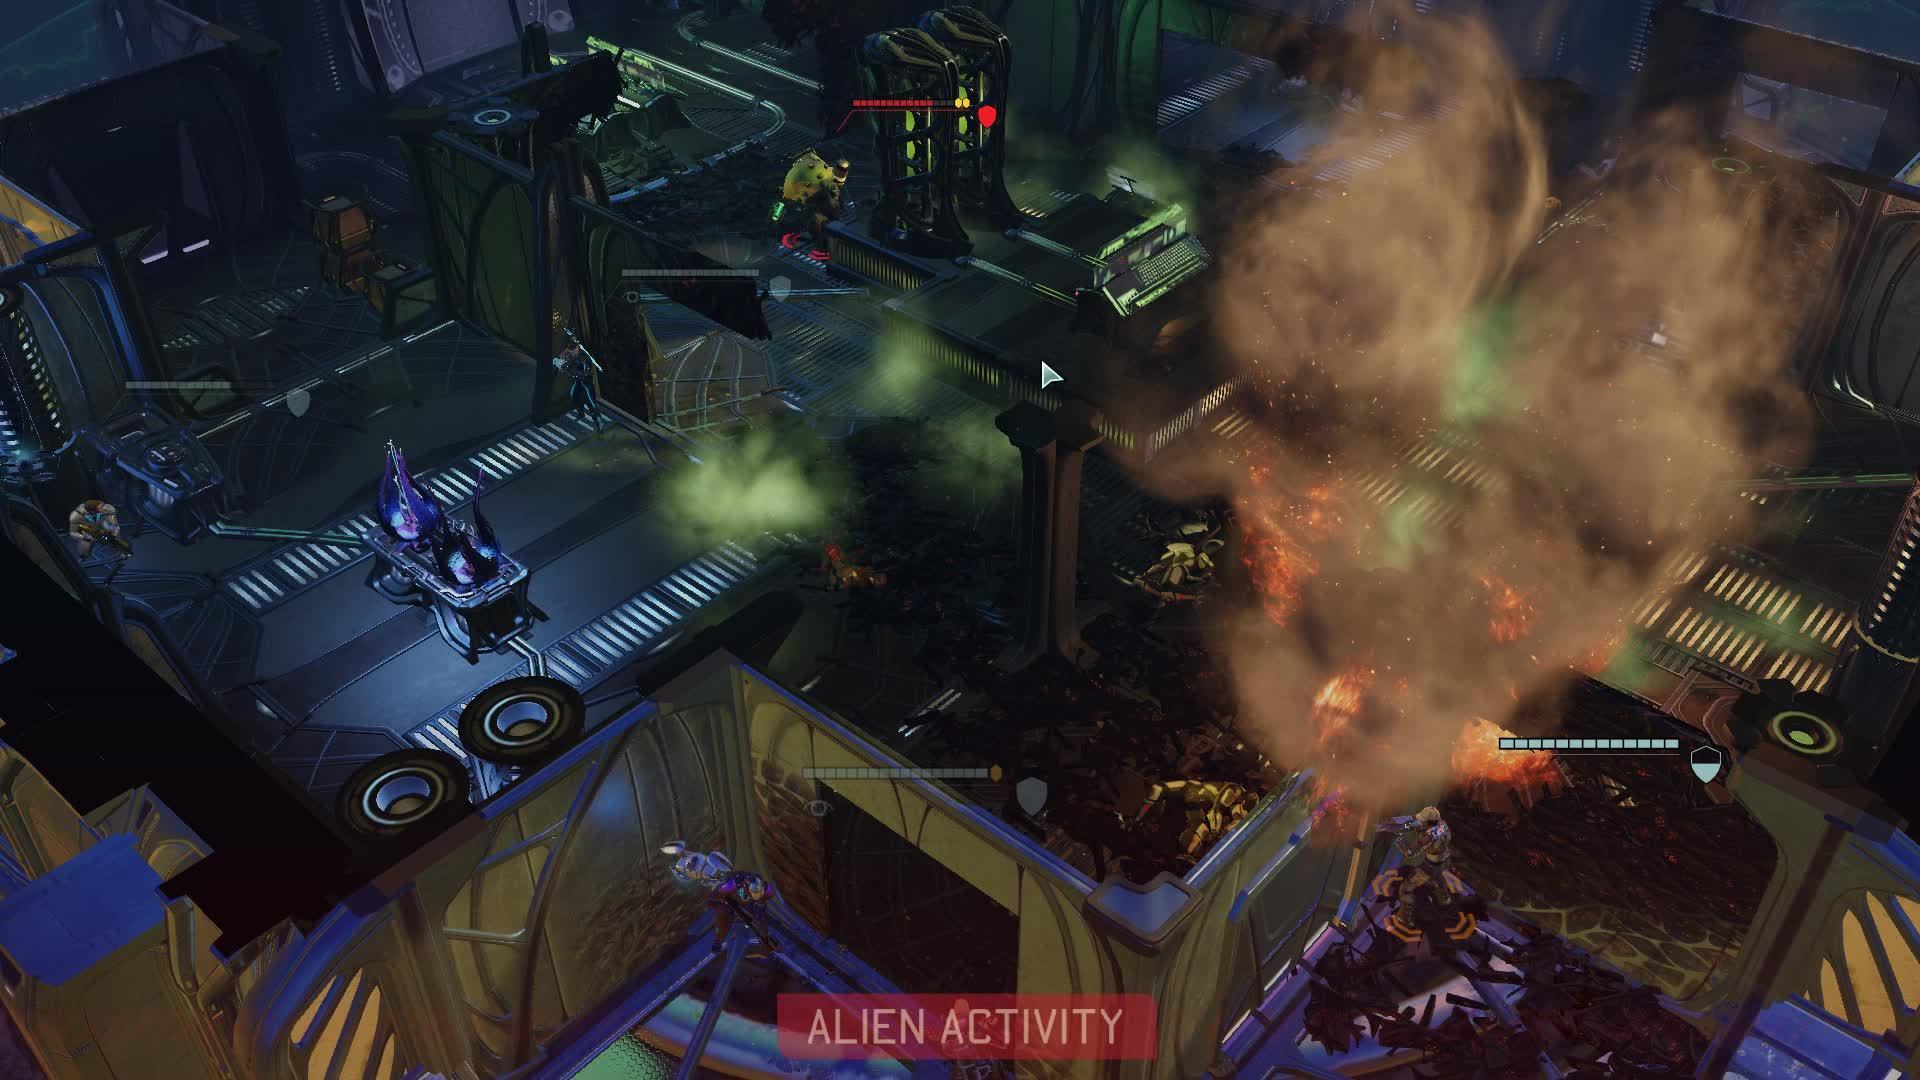 XCOM 2 overwatch execution GIFs